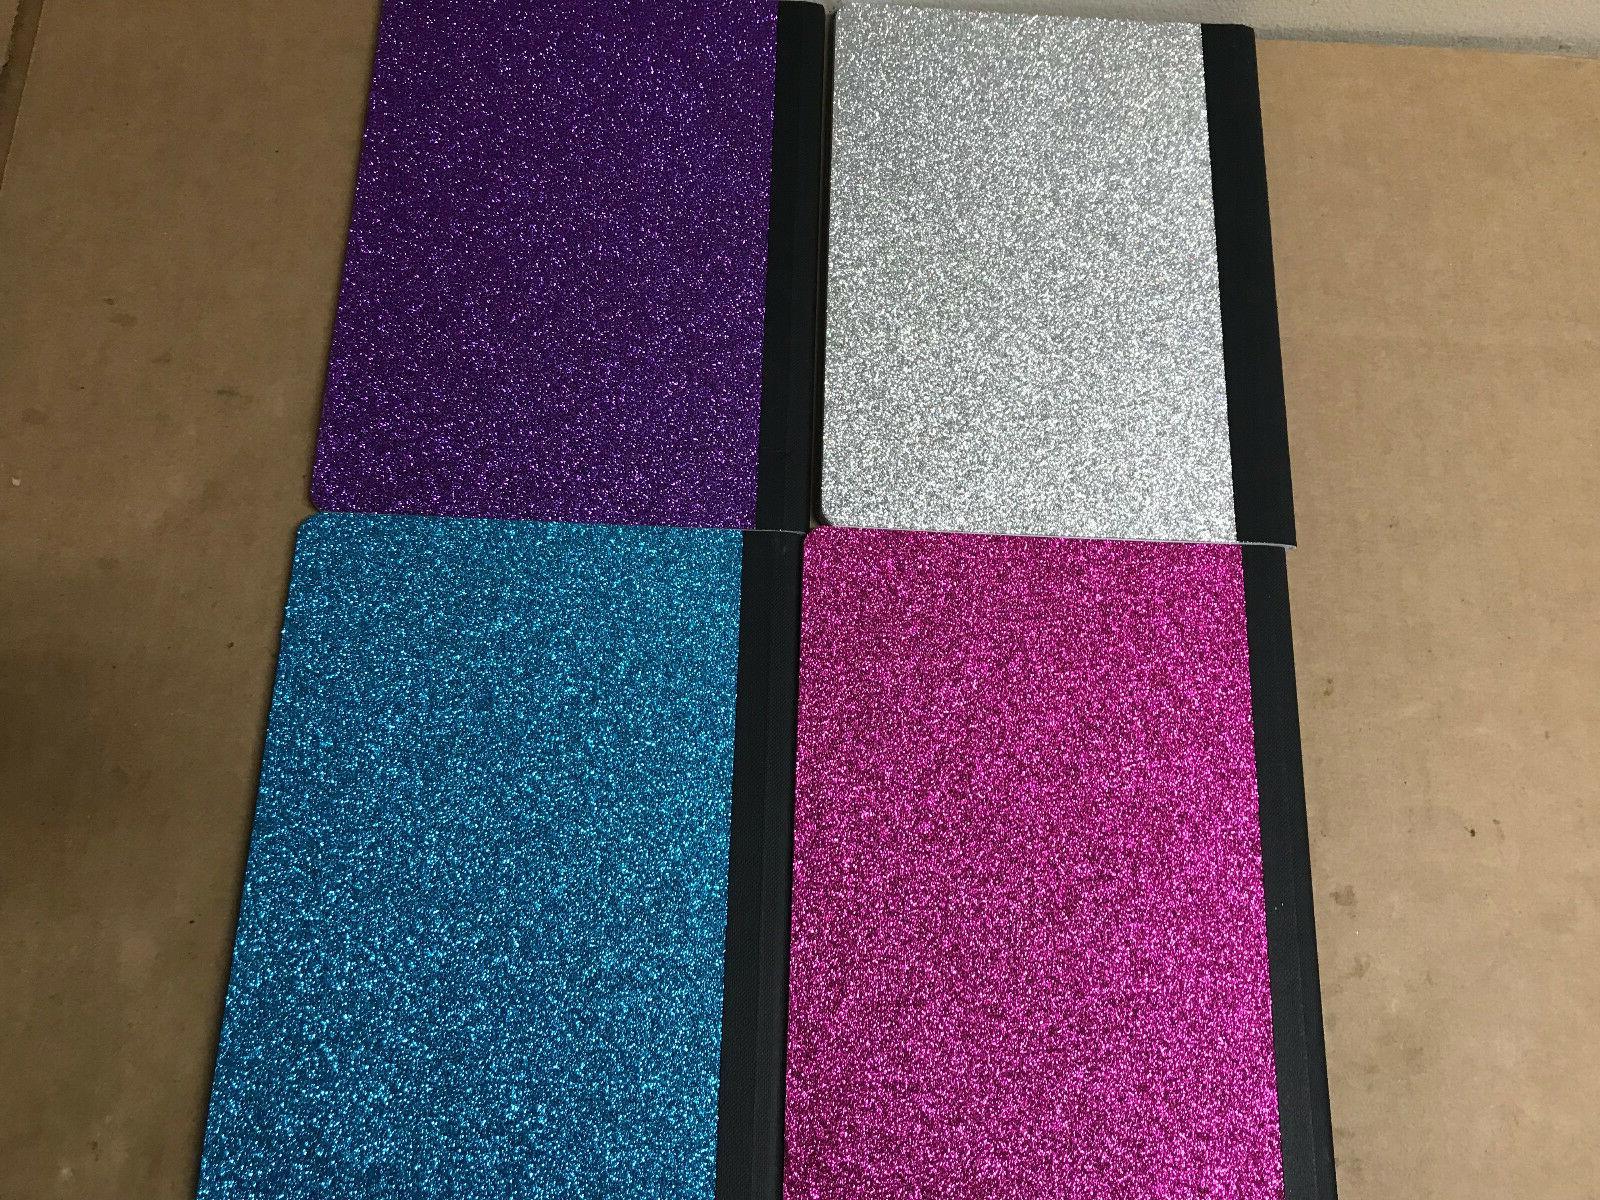 glitter composition book notebook diary journal 9